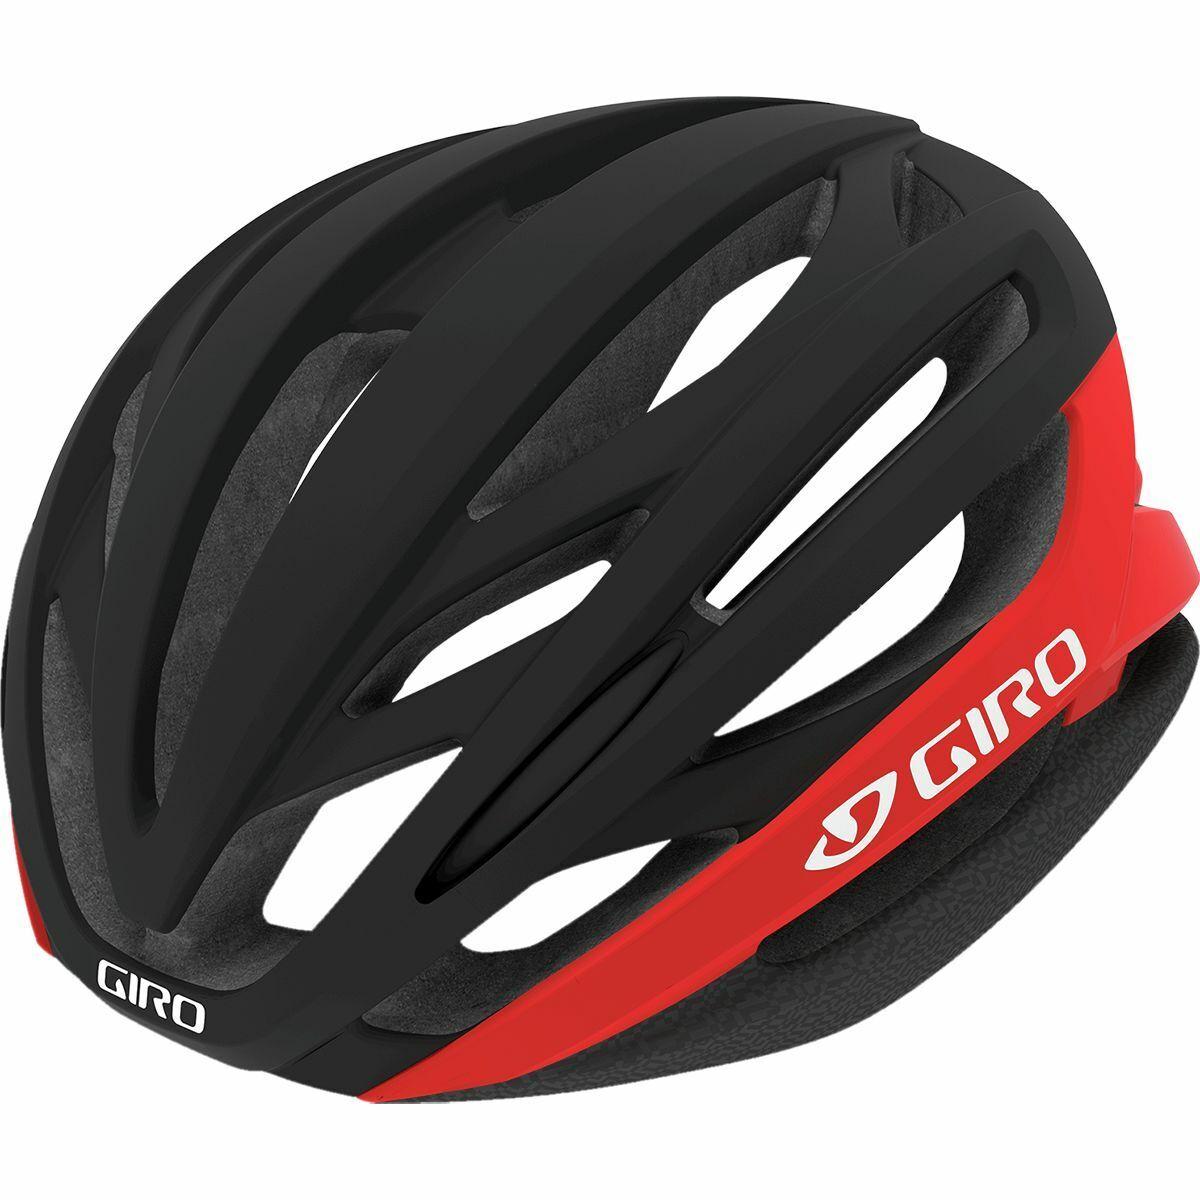 Large Bright Red//Black Giro Unisex Adult Foray Helmet